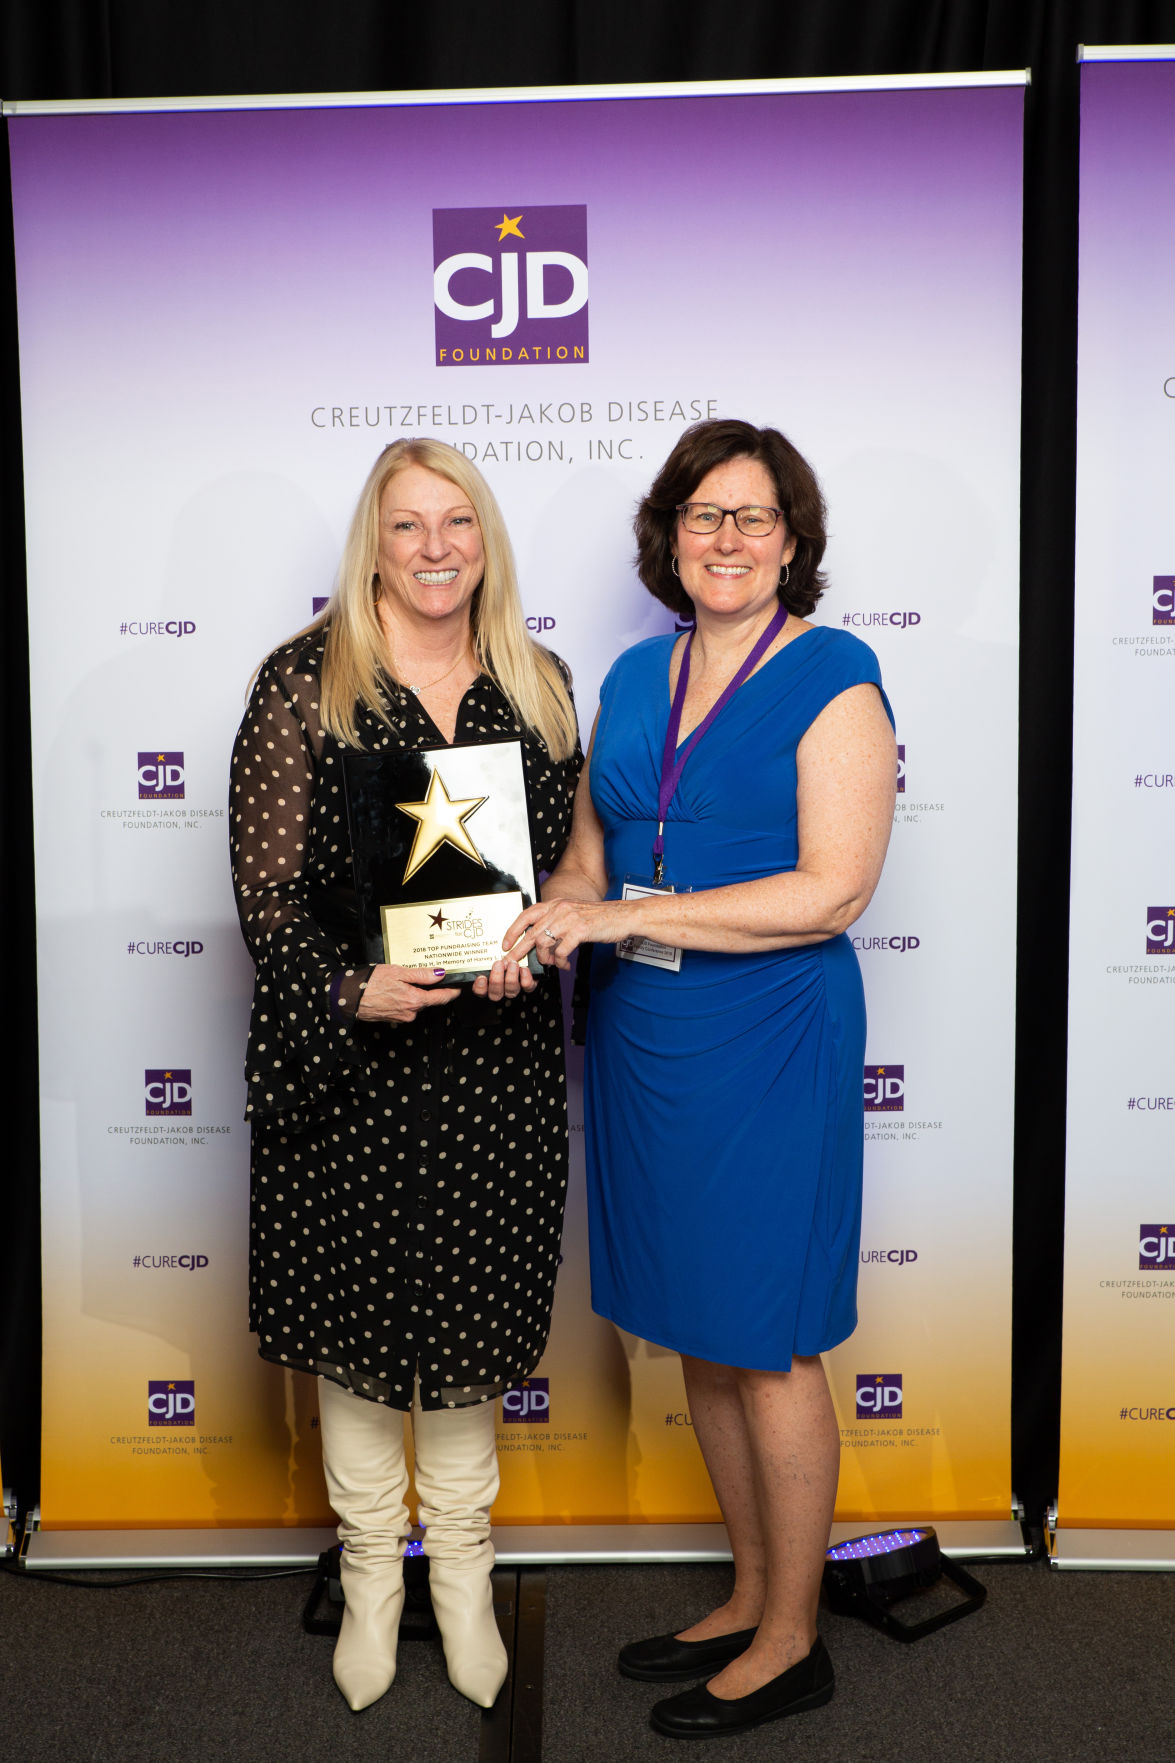 Lavonne Hall-receives-award-Debbie Yobs-CJD Foundation President.